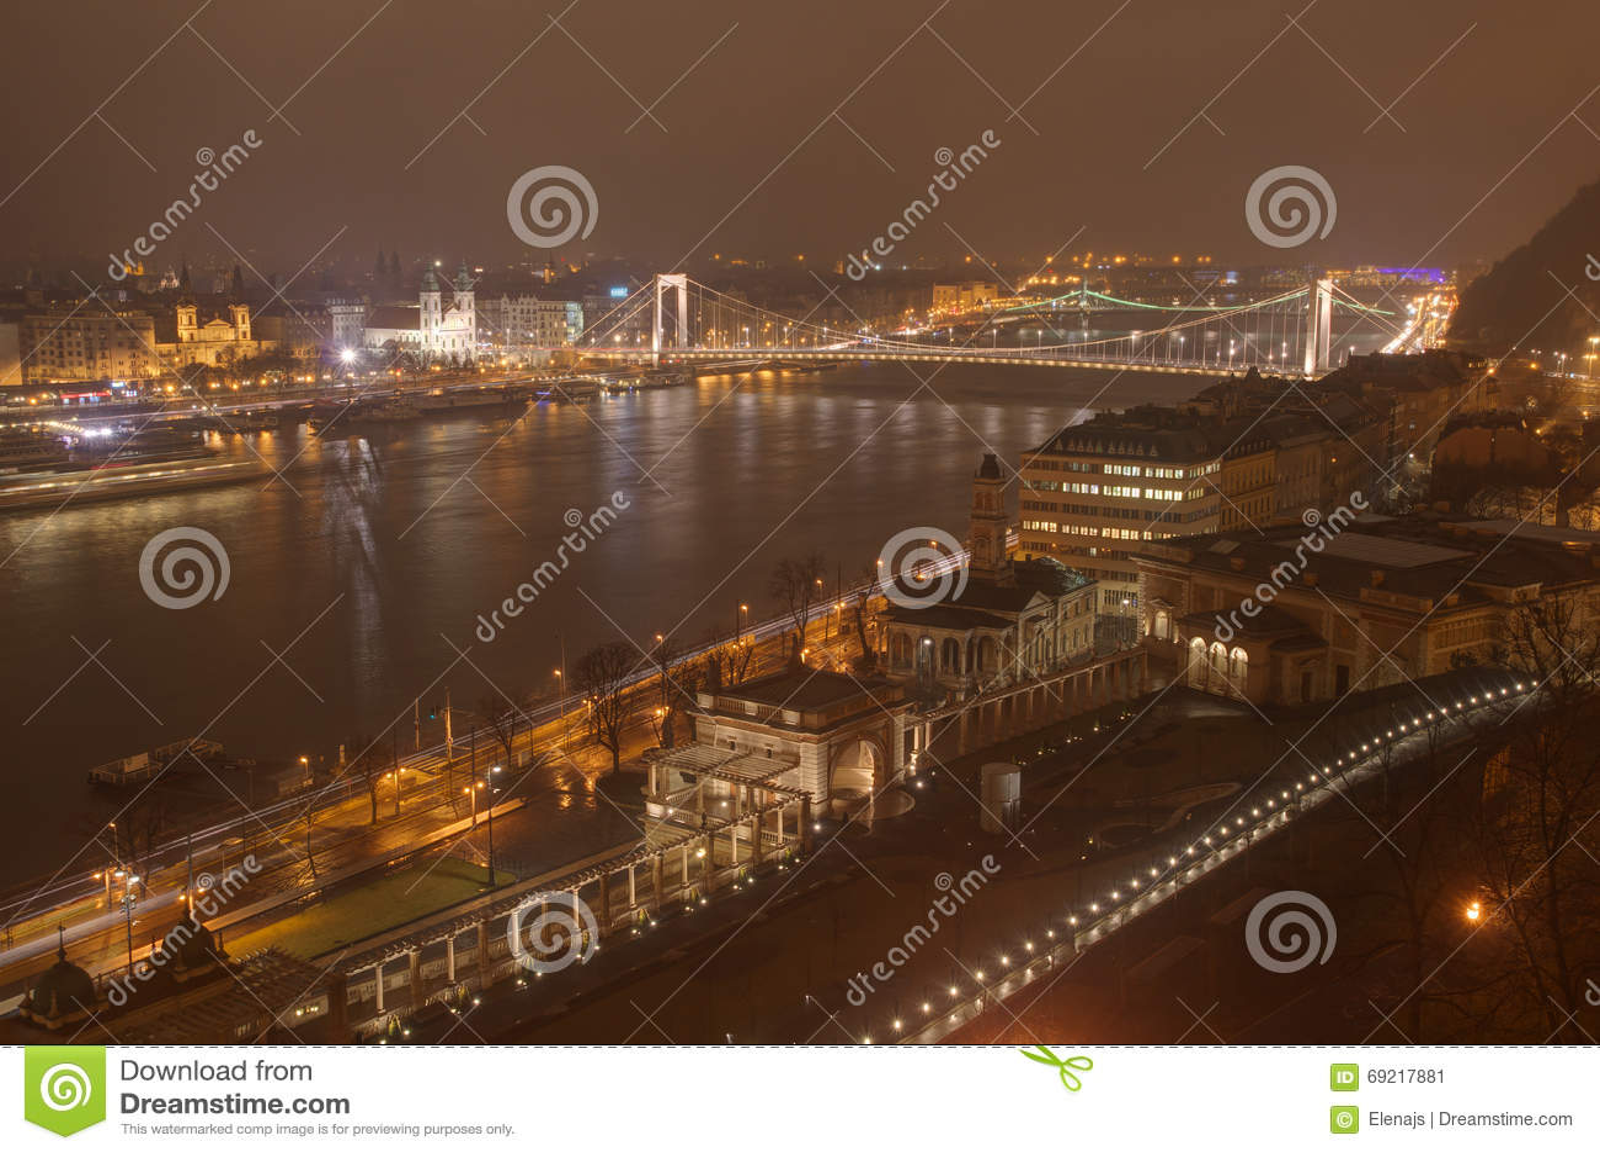 Budapest varkert casino the best casino sites